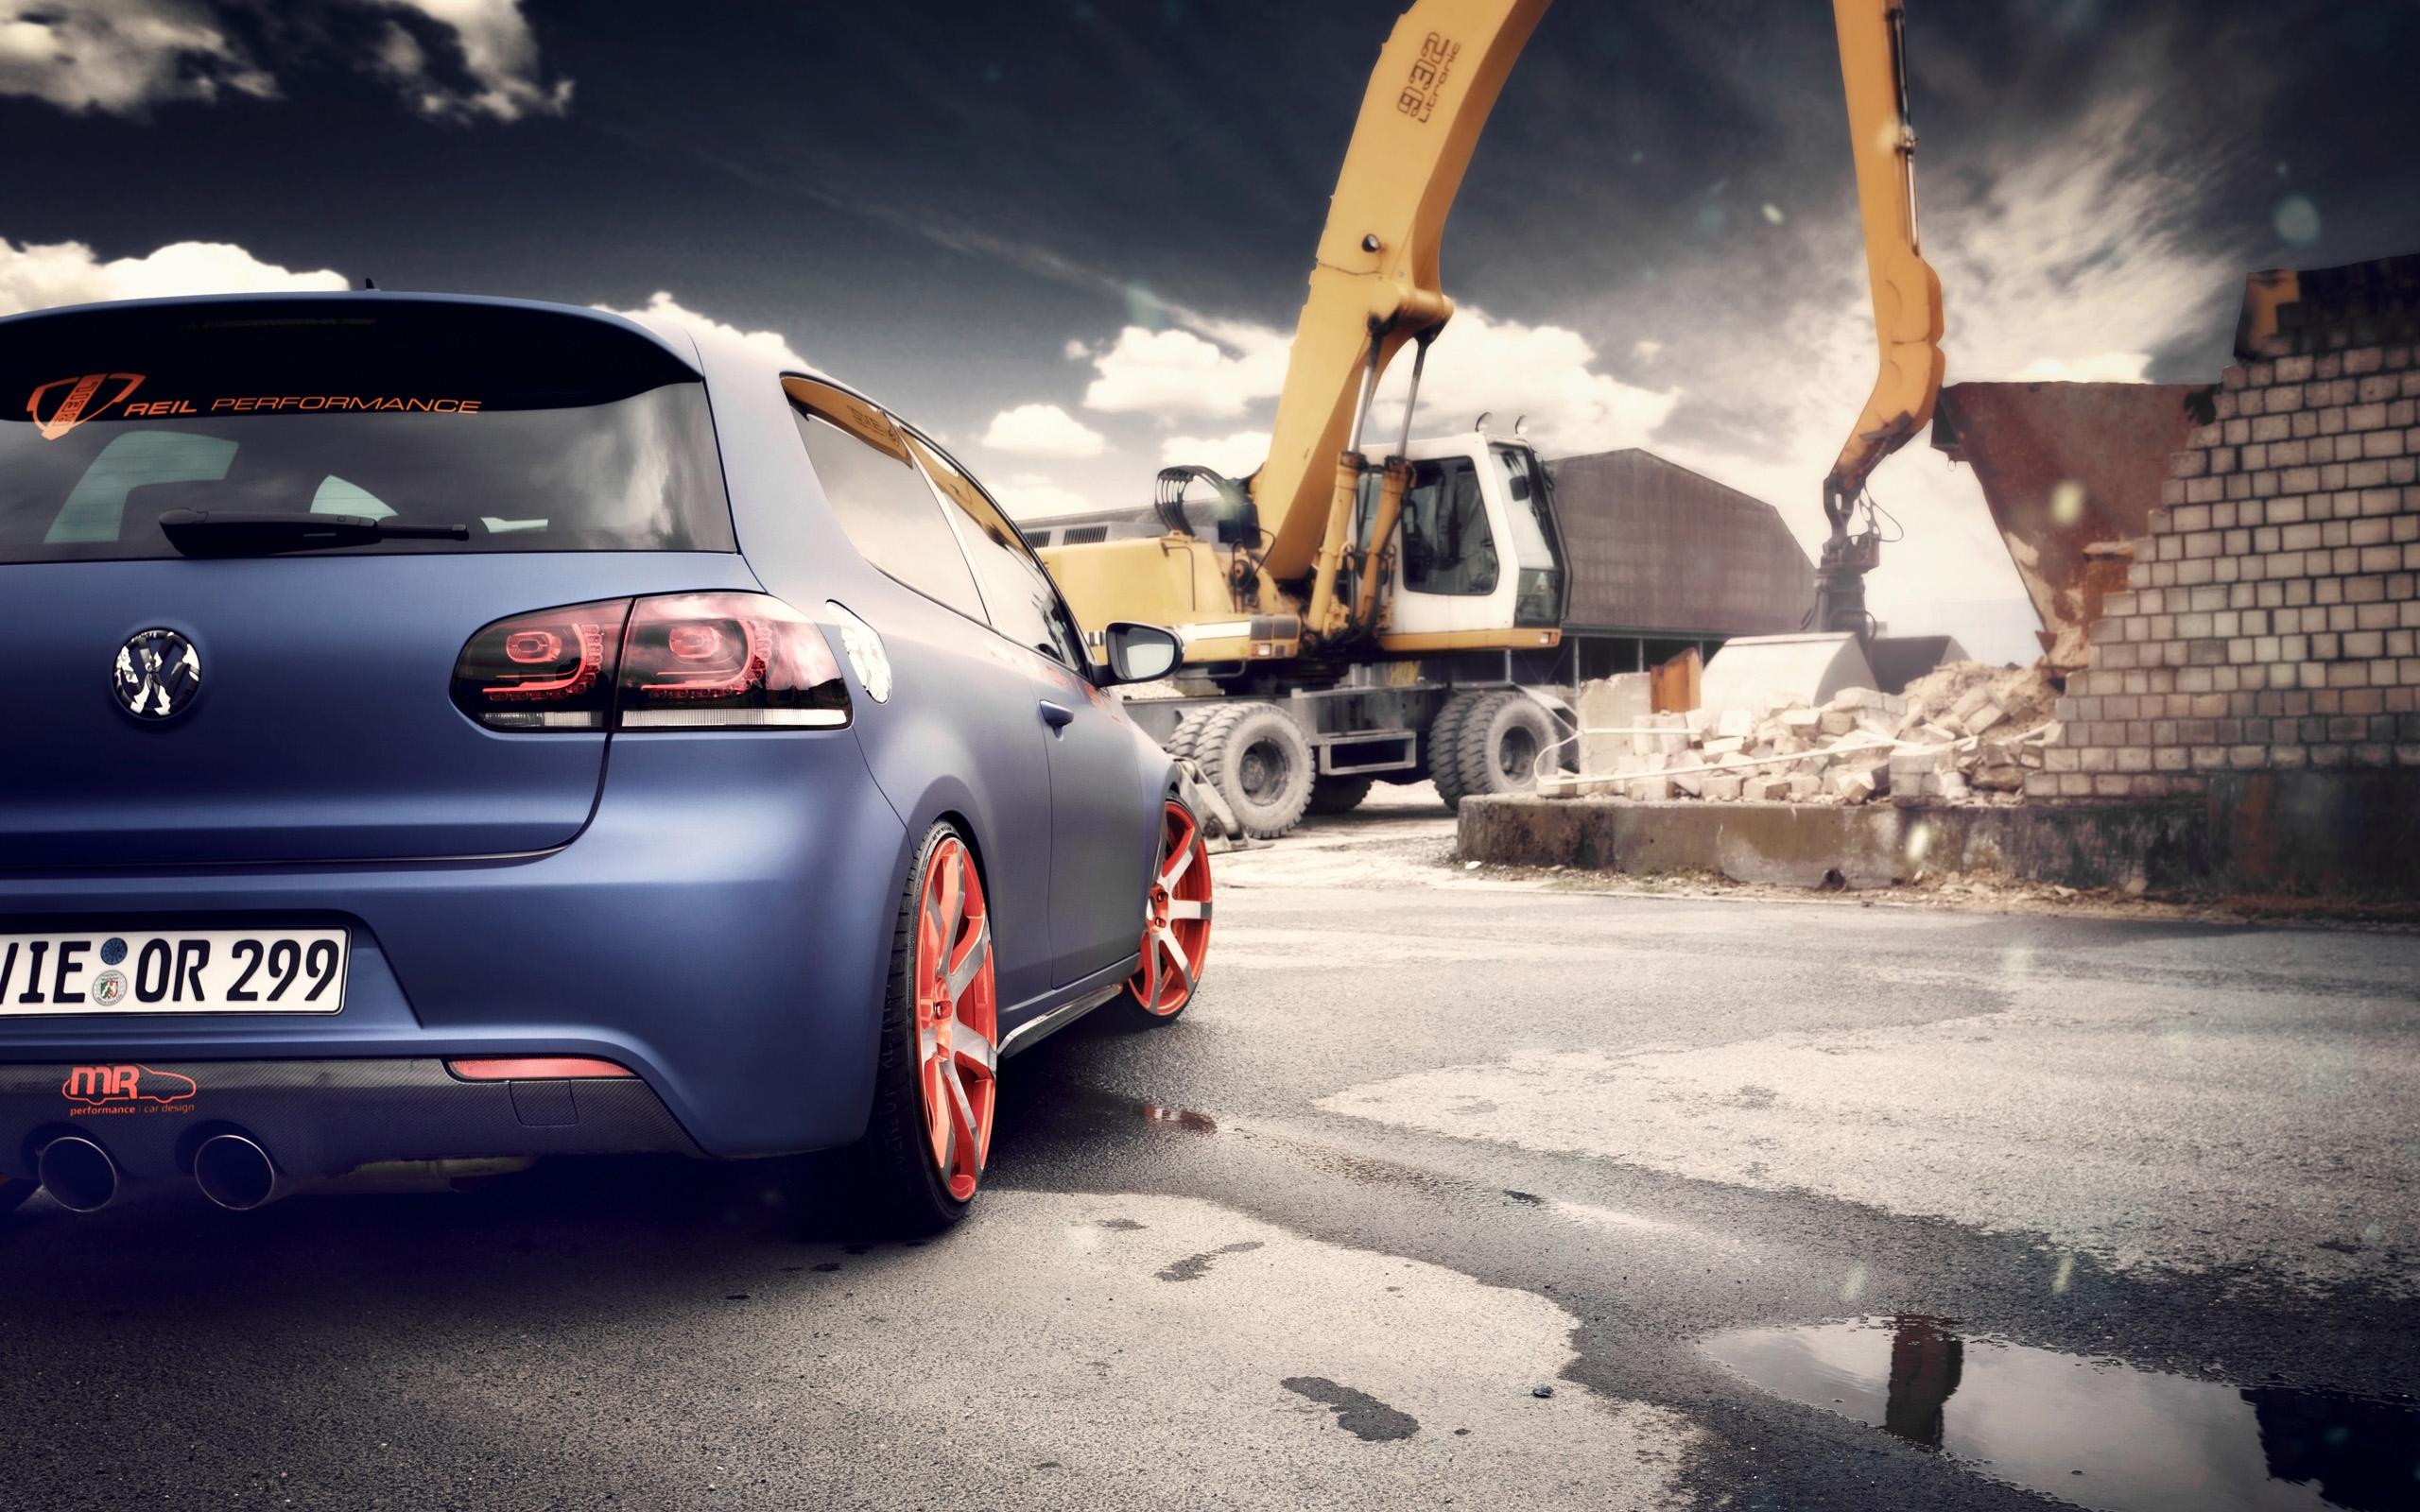 2012 Bbm Volkswagen Golf Golf 6 1723932 Hd Wallpaper